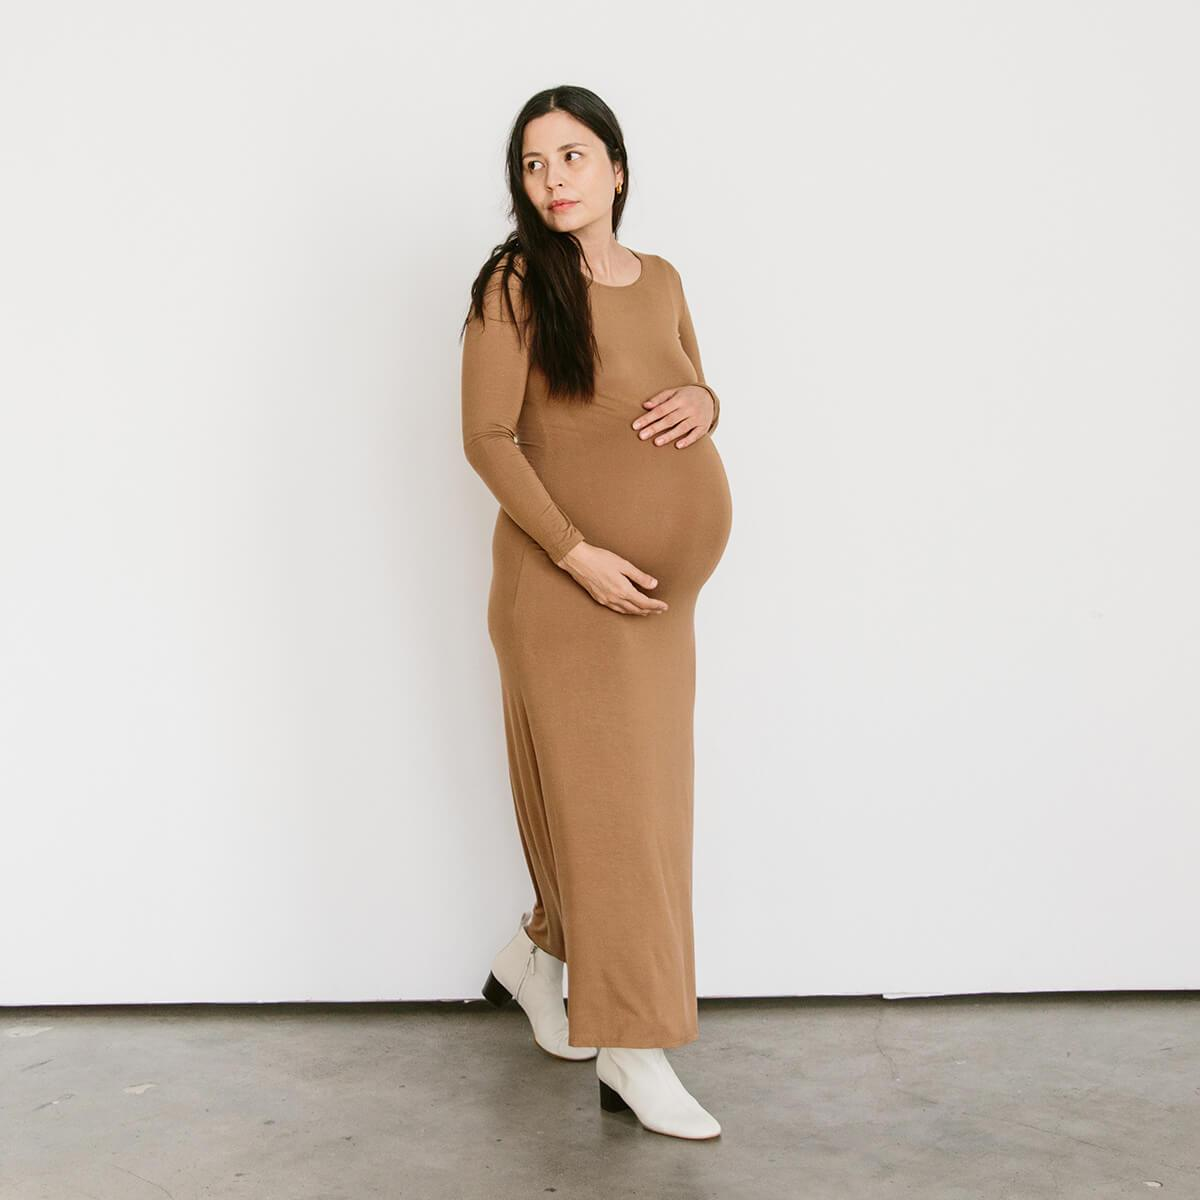 Storq maternity